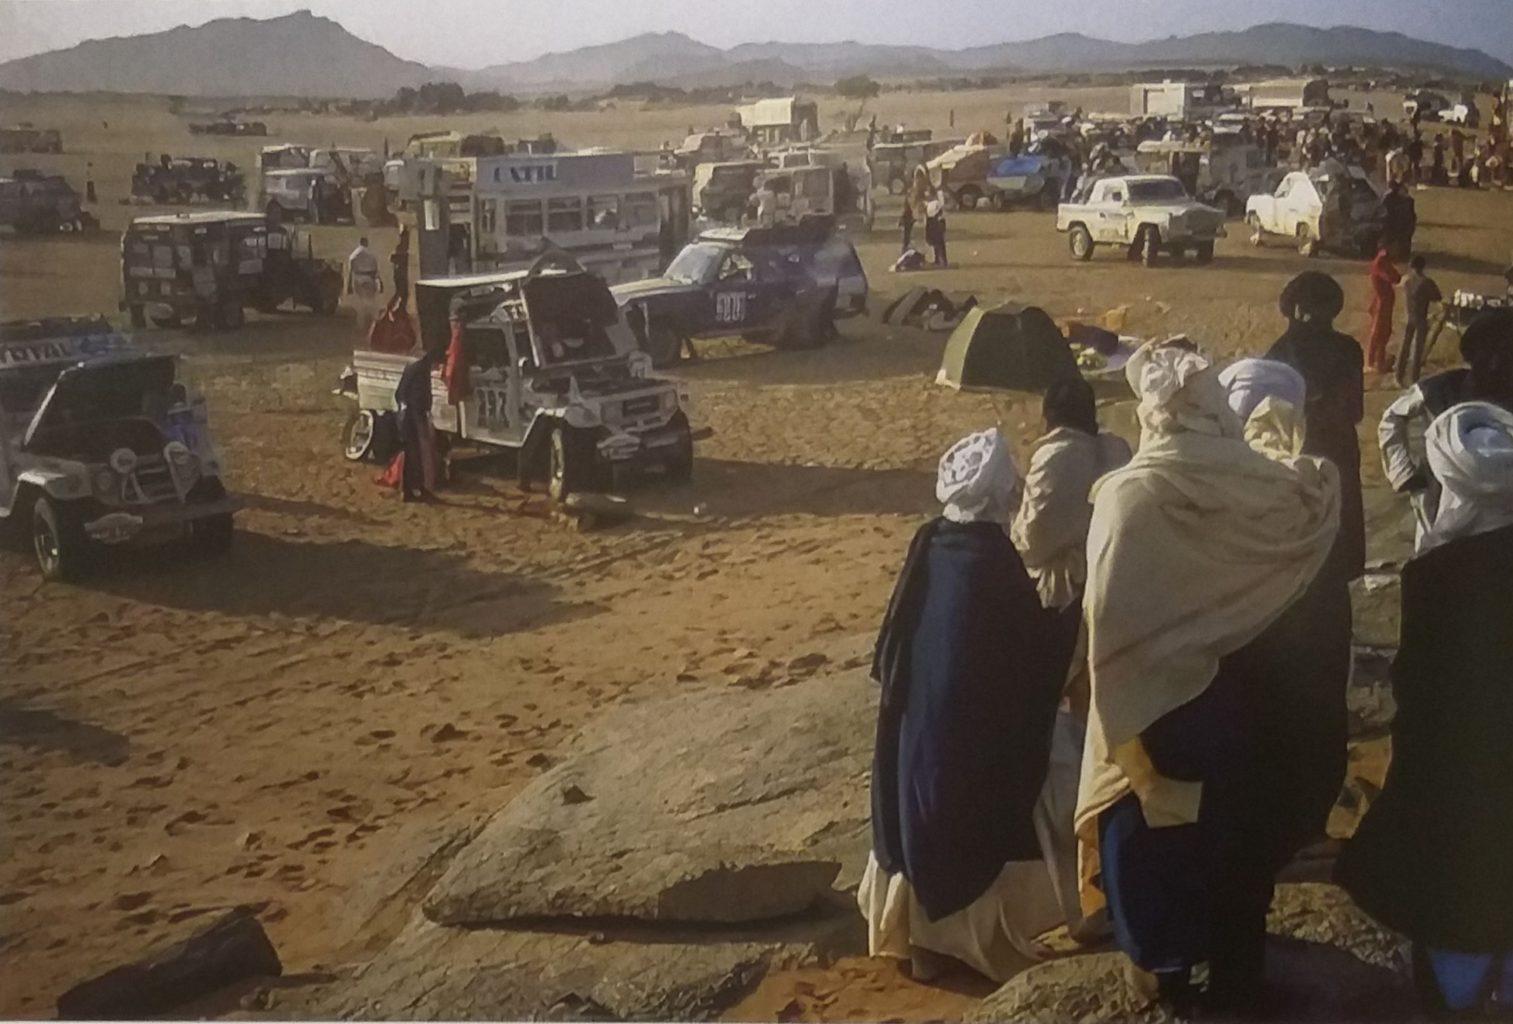 Бивуак (стоянка) на ралли «Париж-Дакар» в Африке (1984 год)